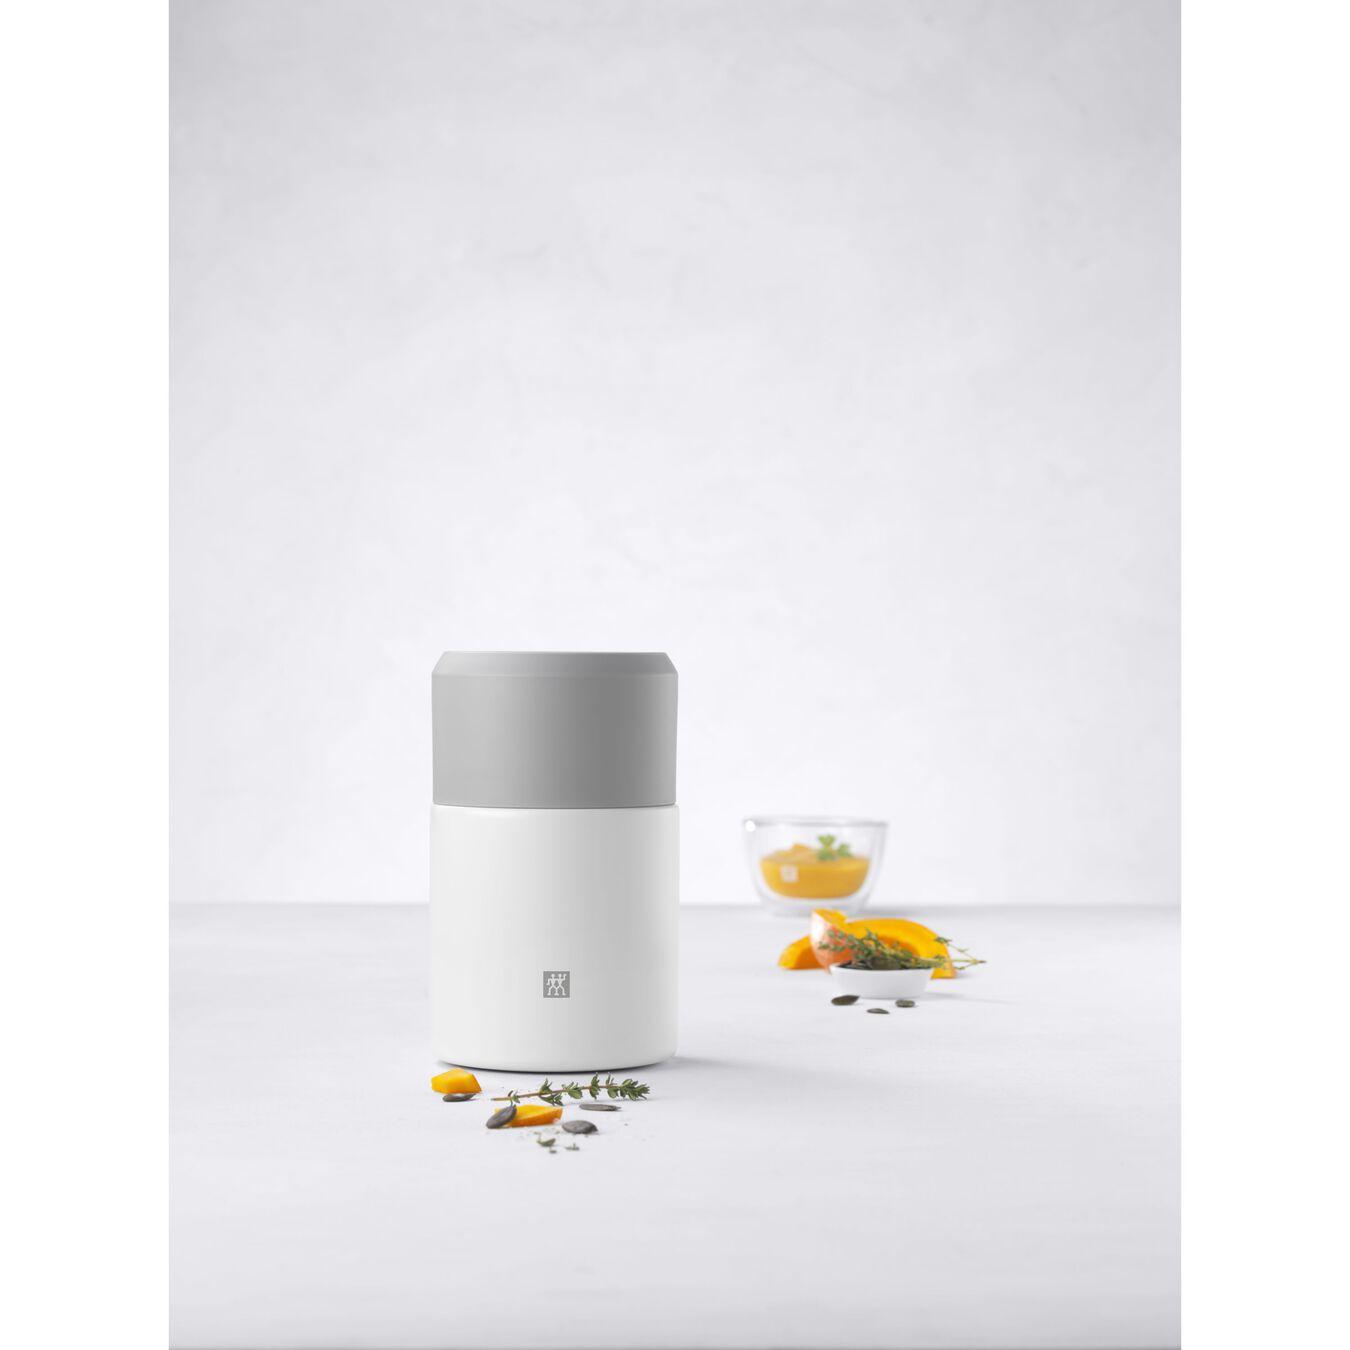 Recipiente alimentare - 700 ml, acciaio inox, bianco,,large 6